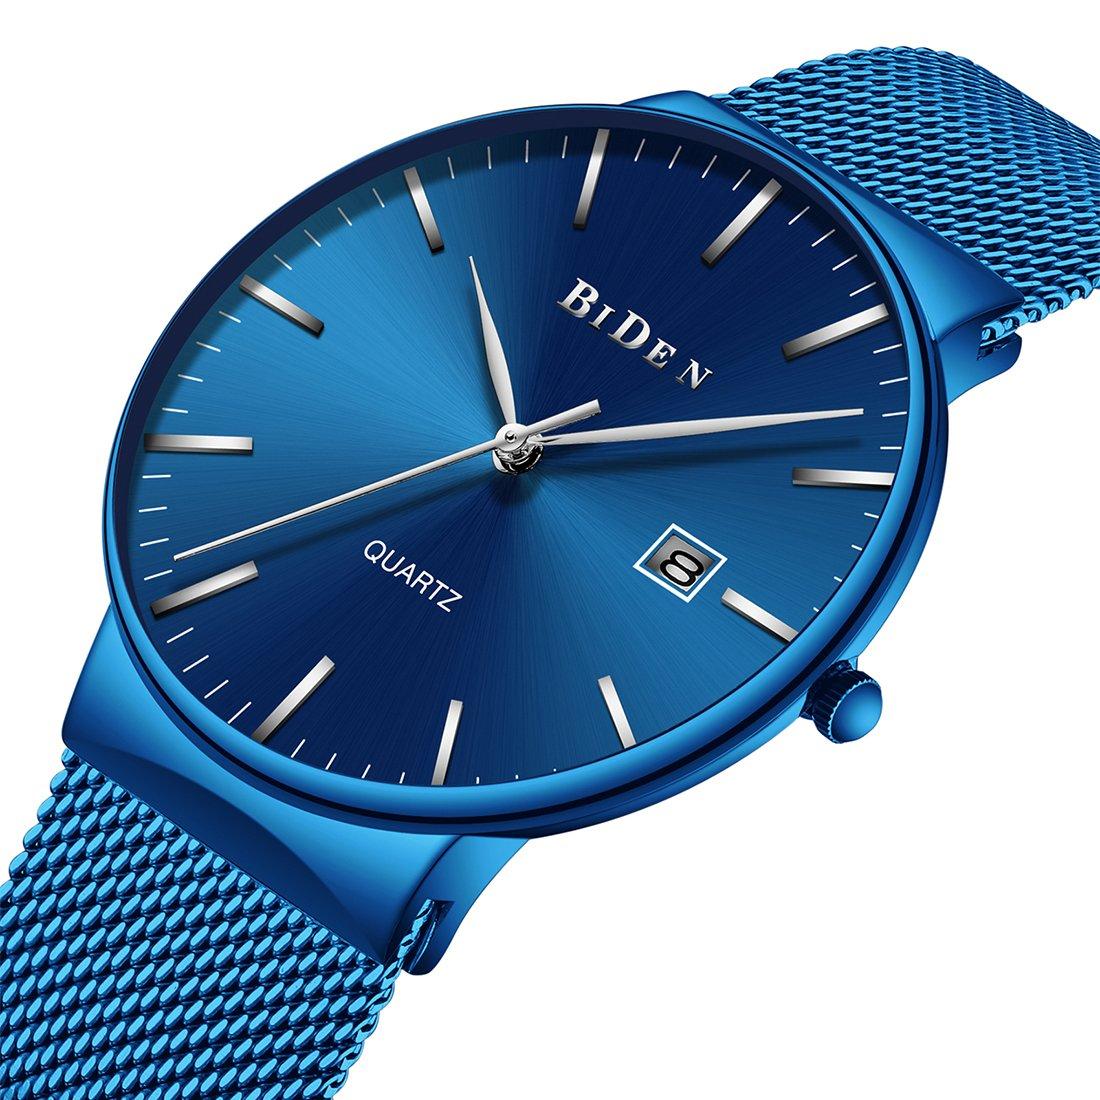 Mens Minimalist Watches Men Waterproof Luxury Casual Wrist Watch Stainless Steel Mesh Watch for Men Blue